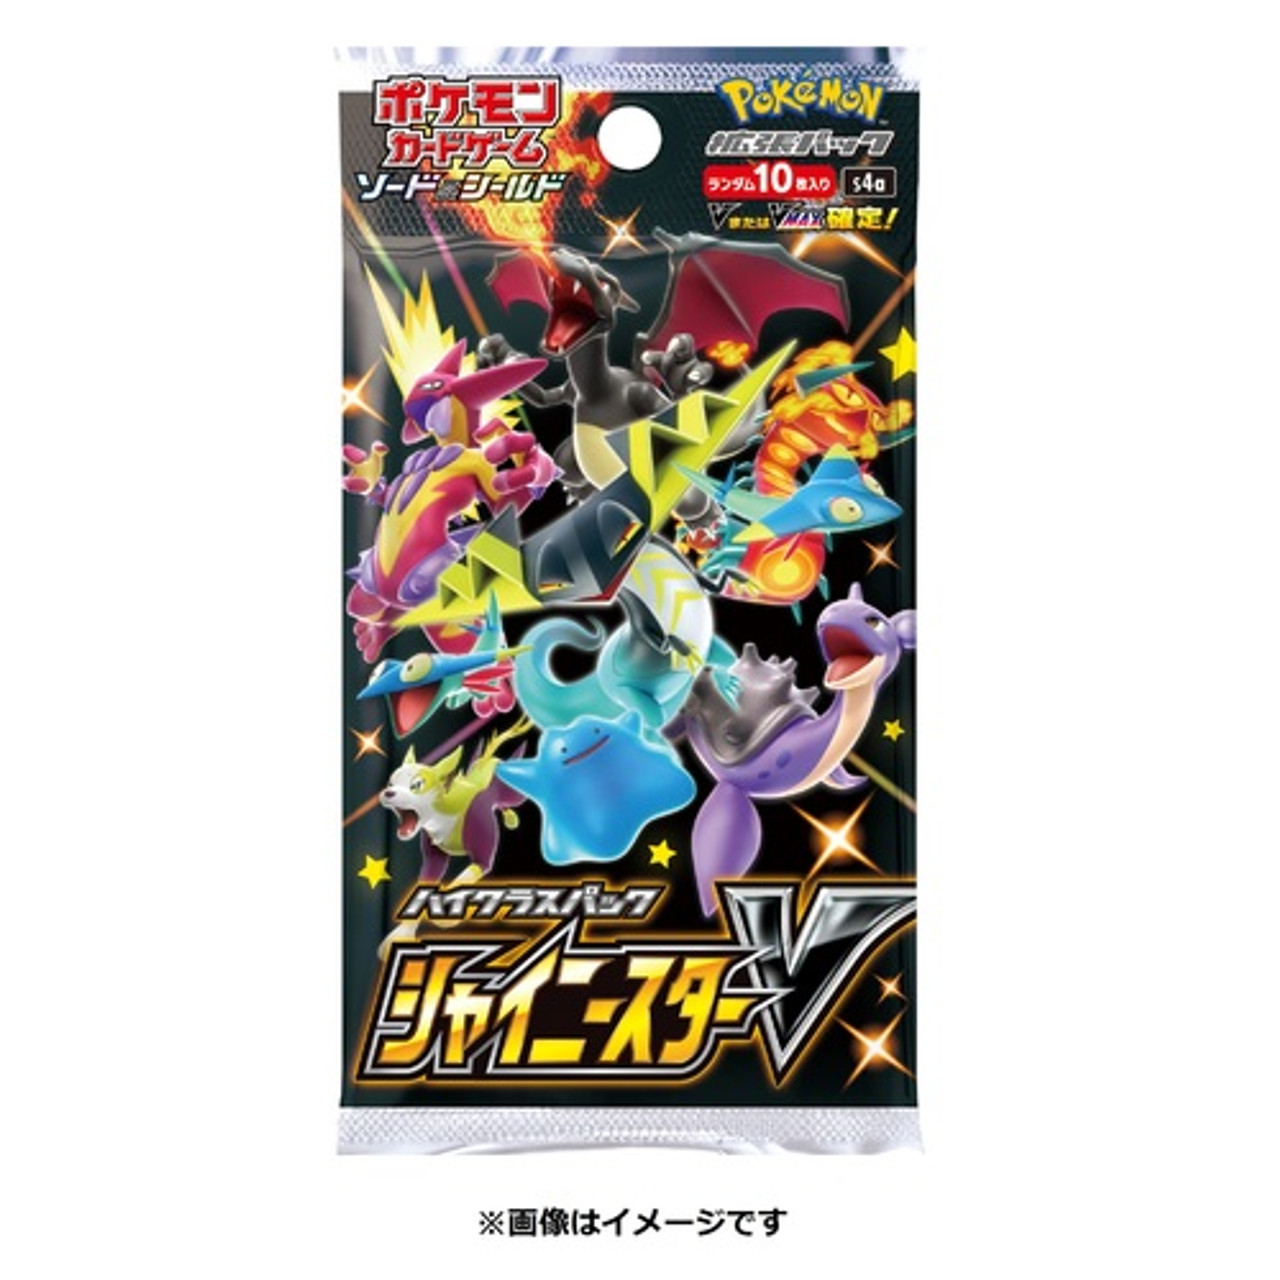 Pre Pokemon Card Game Sword /& Shield Shiny Box Crobat V mid-February shipment